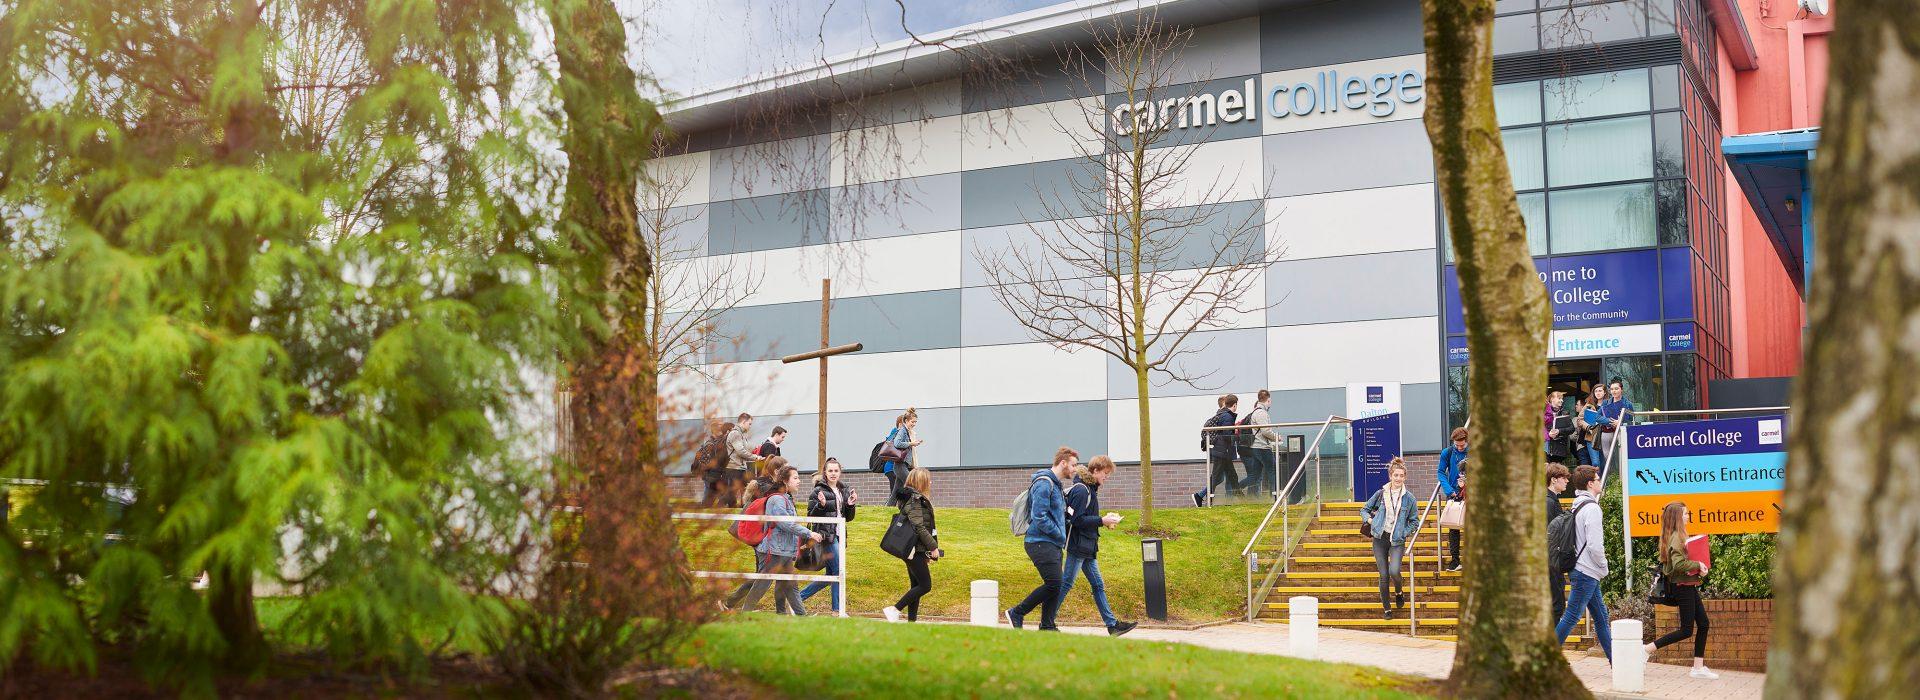 Carmel College term dates